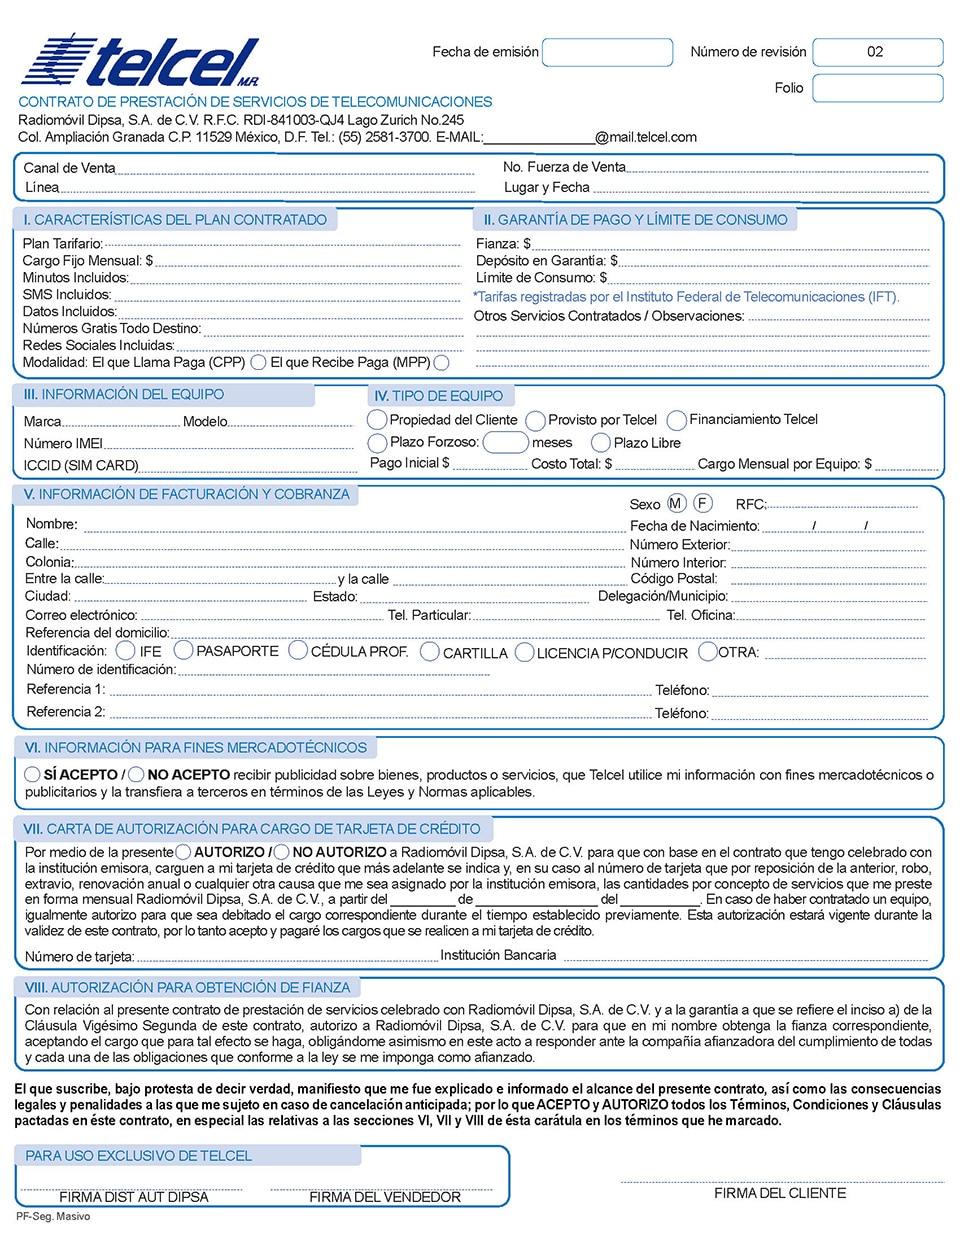 Contrato de prestaci n de servicios corporativo telcel for Contrato documento